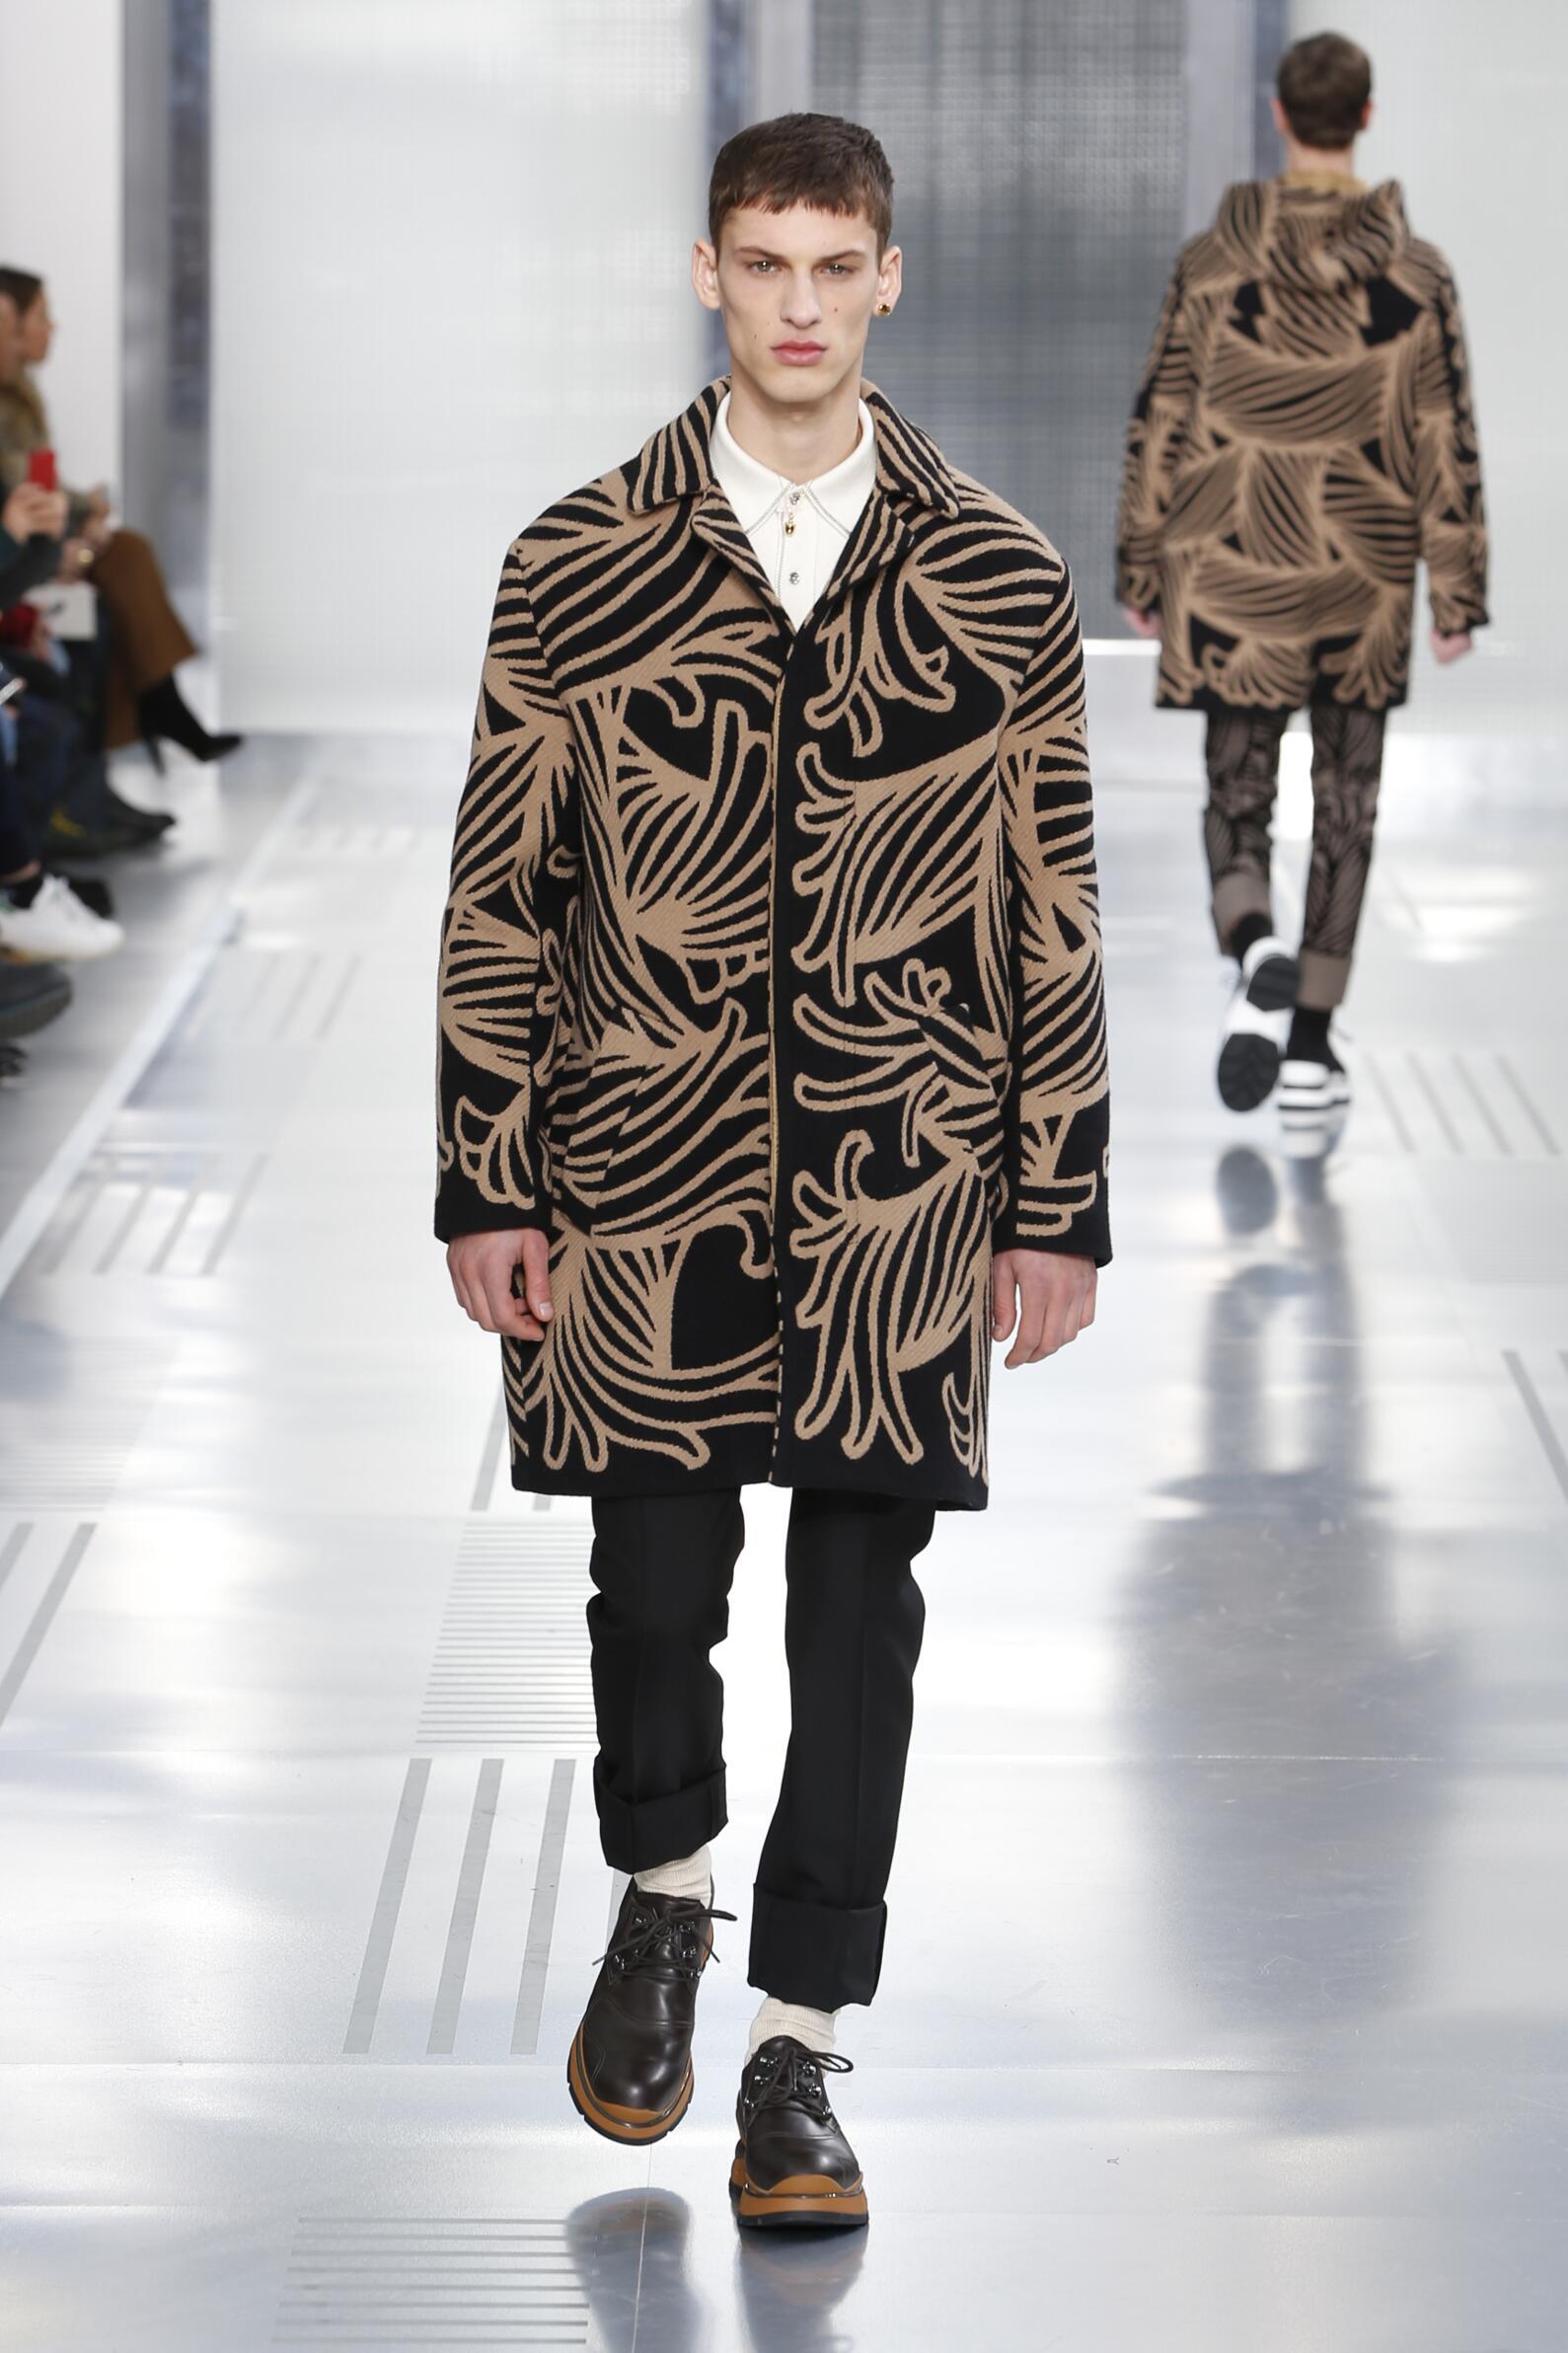 Catwalk Louis Vuitton Fall Winter 2015 16 Men's Collection Paris Fashion Week